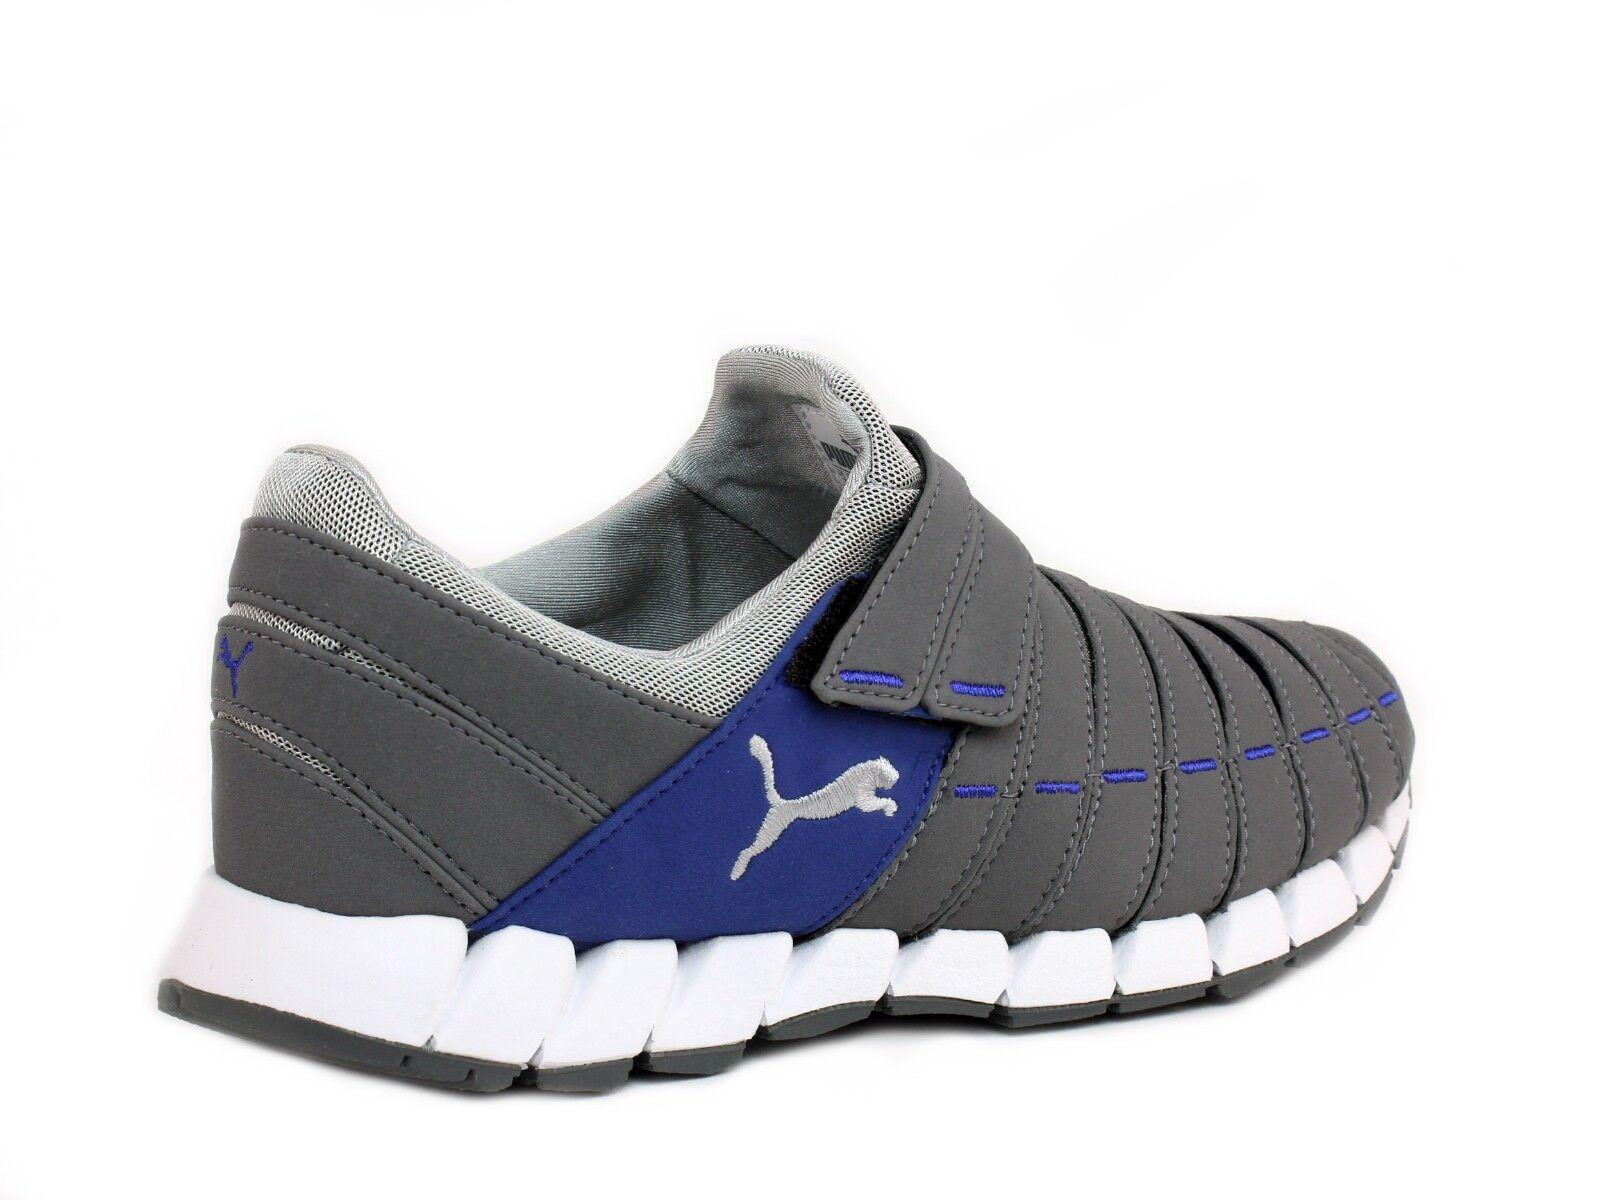 les les les chaussures de sport puma osu nm de l'acier gris 71062d